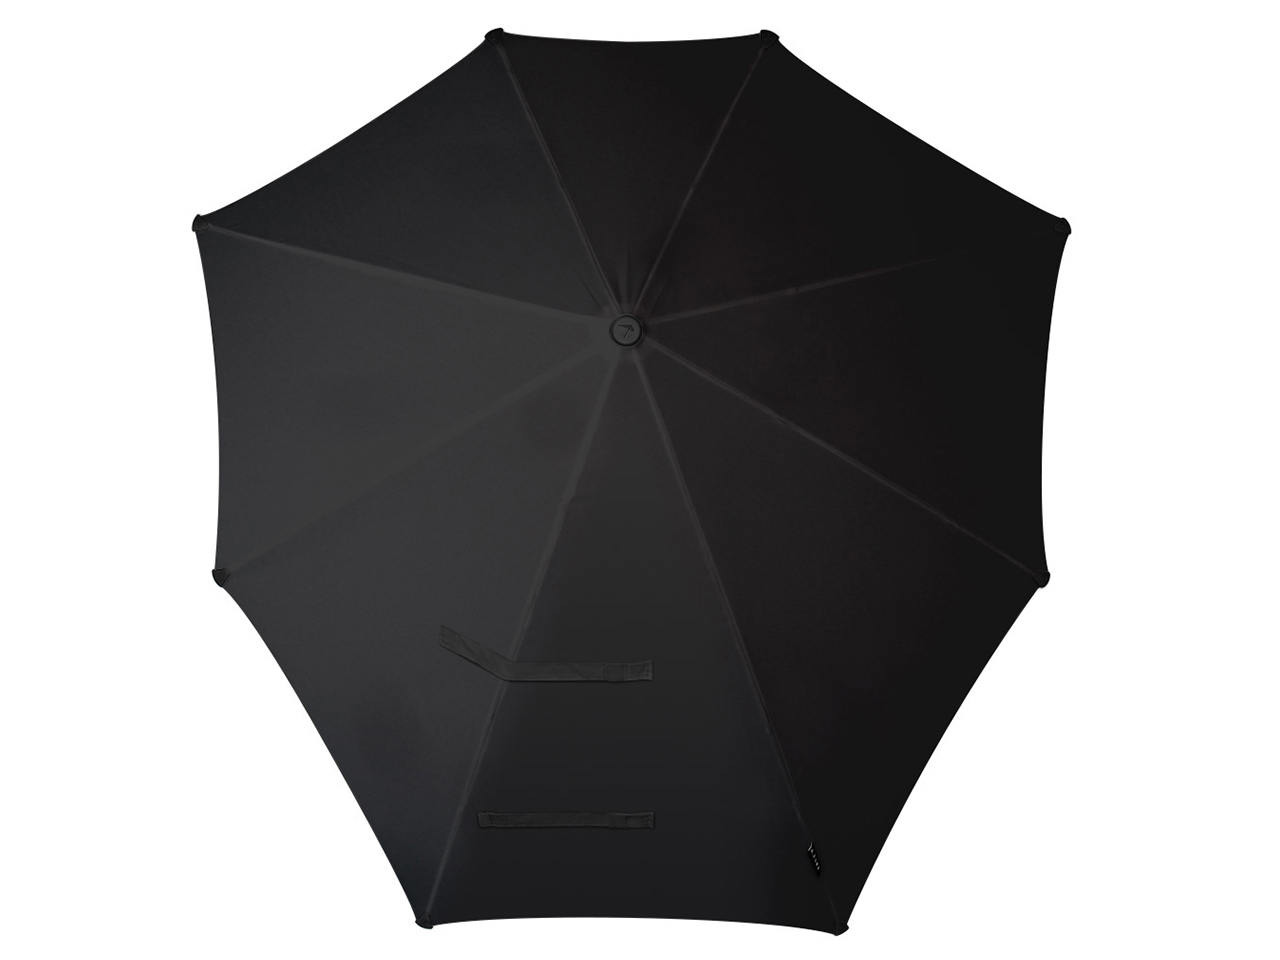 Umbrellas - Senzo Smart Design